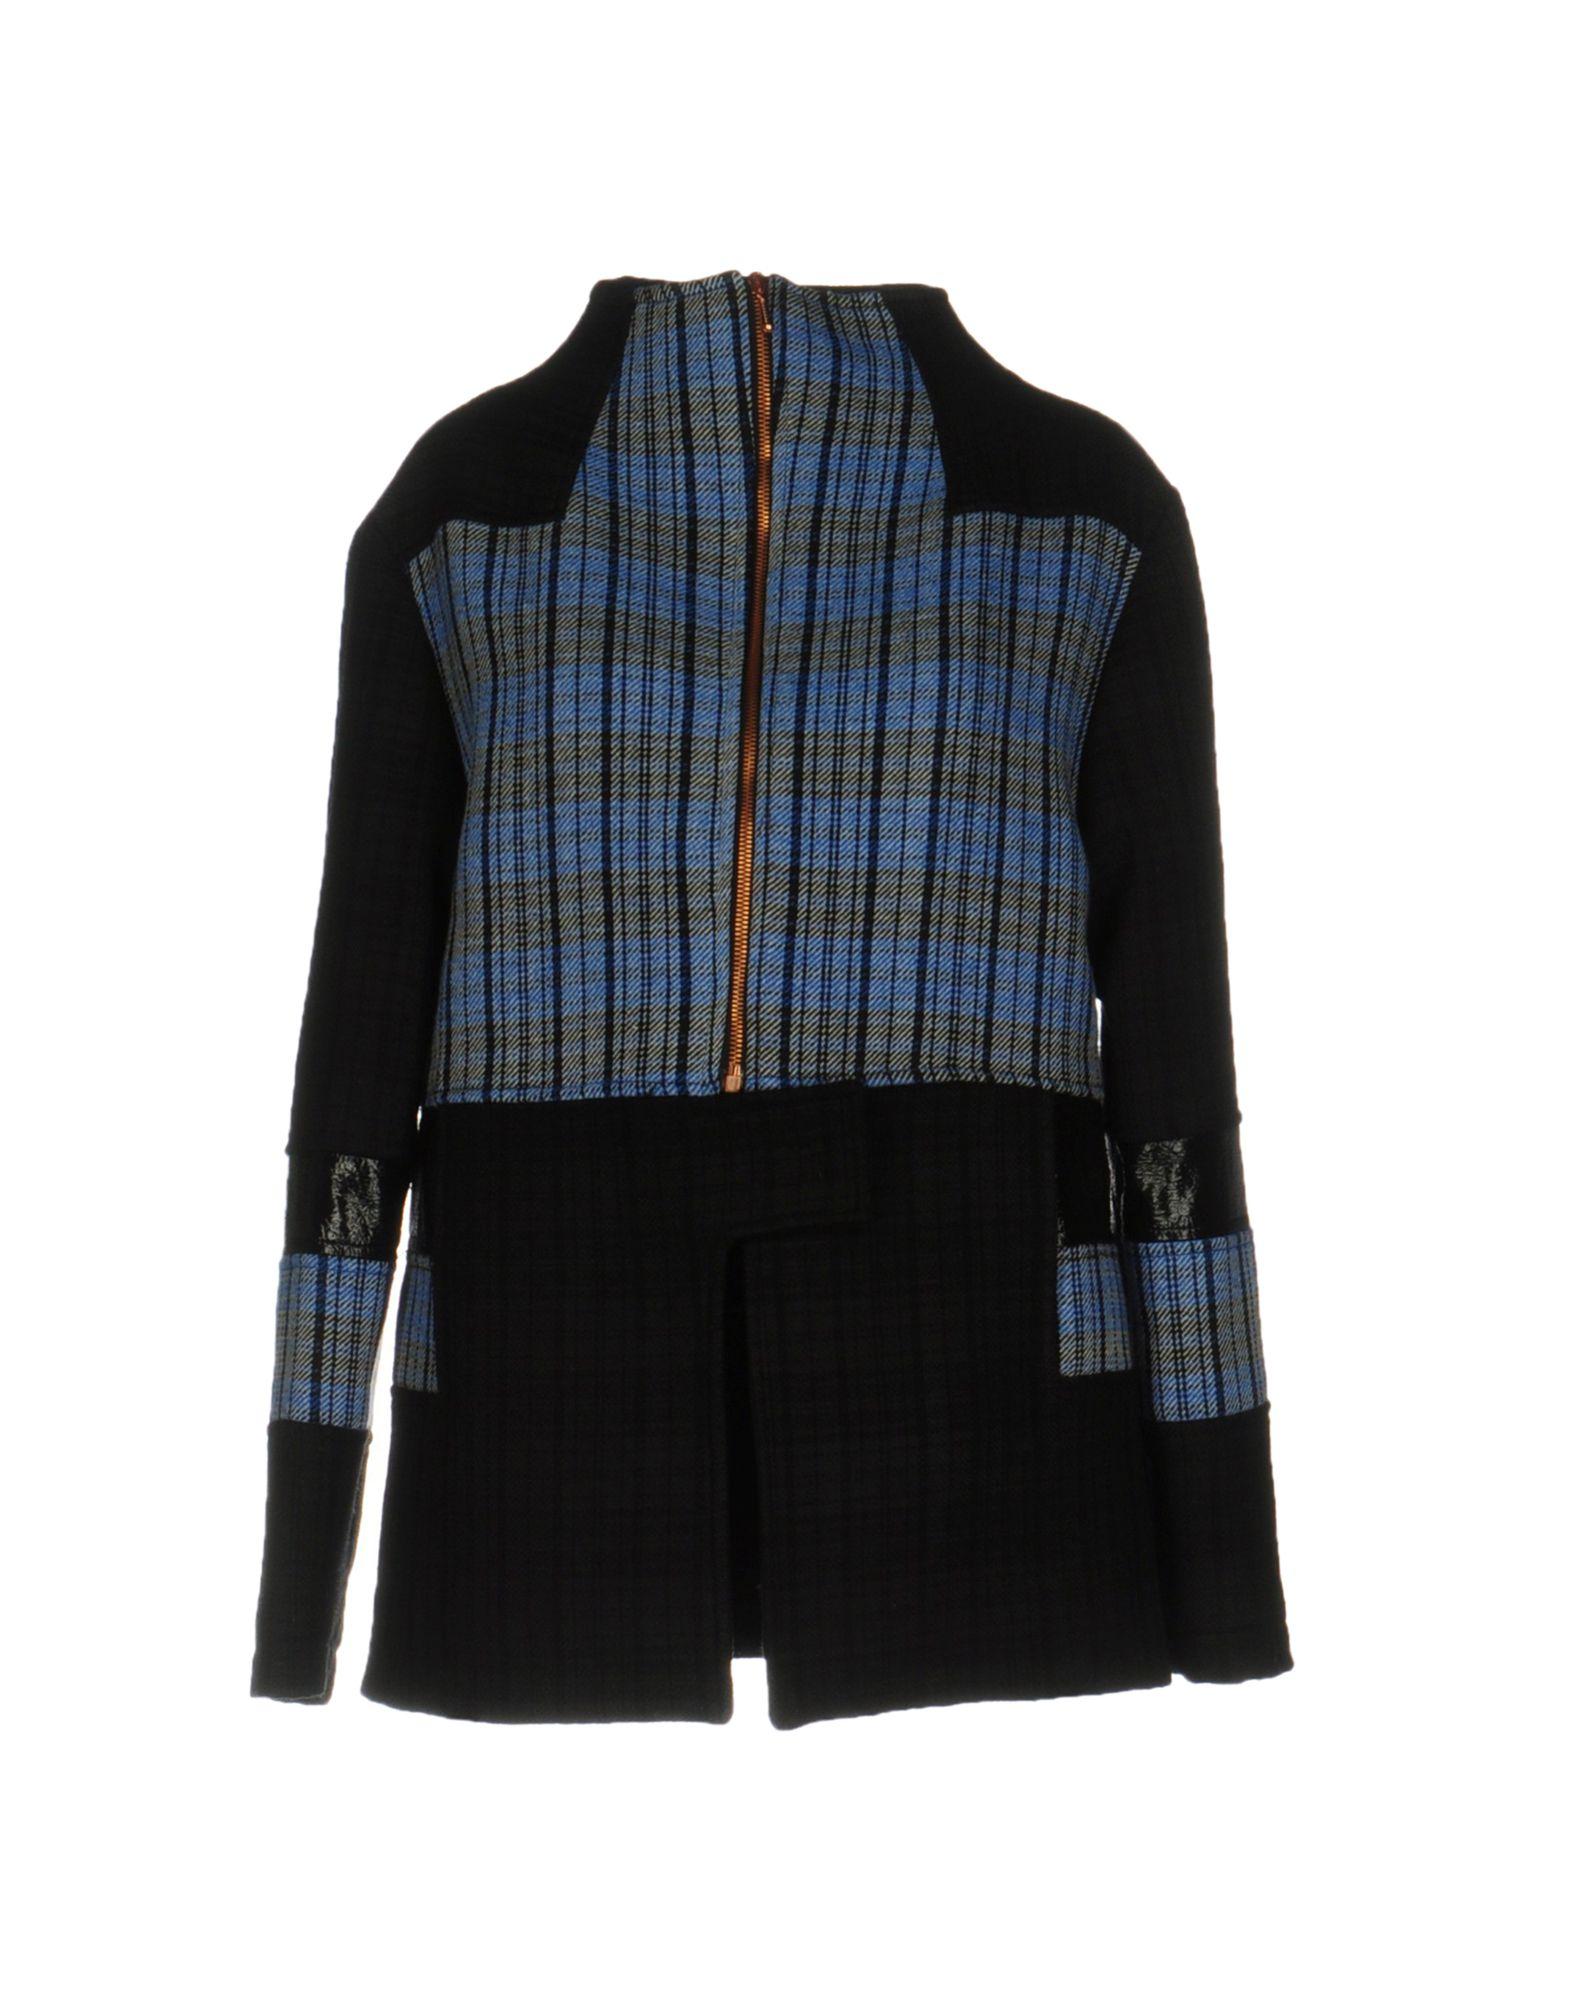 PAOLO ERRICO Coats in Black